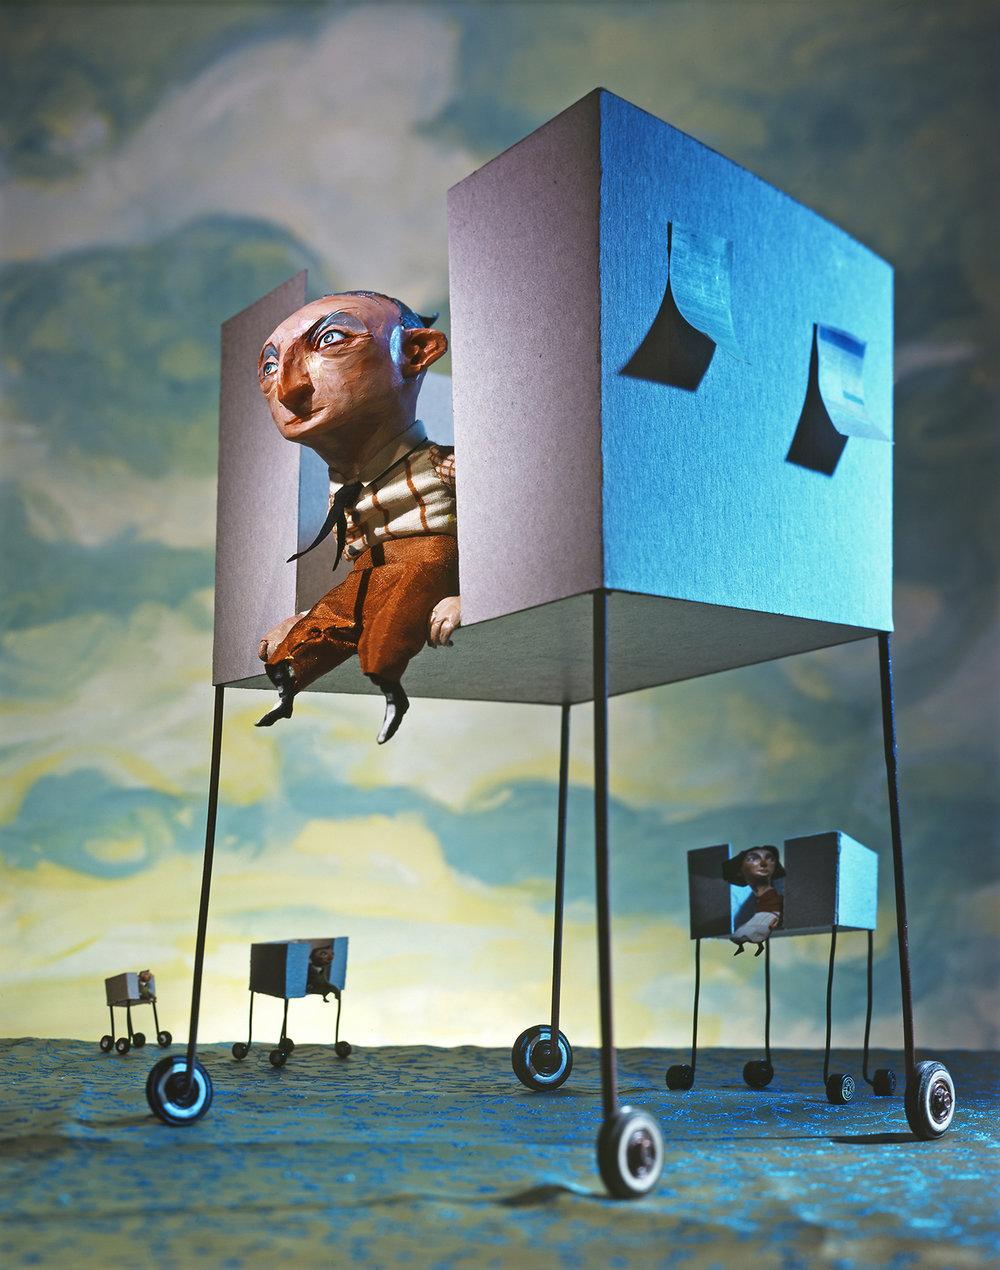 3x3 no.5 2008 - ARTIST: Red Nose StudioTITLE: Rolling CubiclesCLIENT: Plansponsor